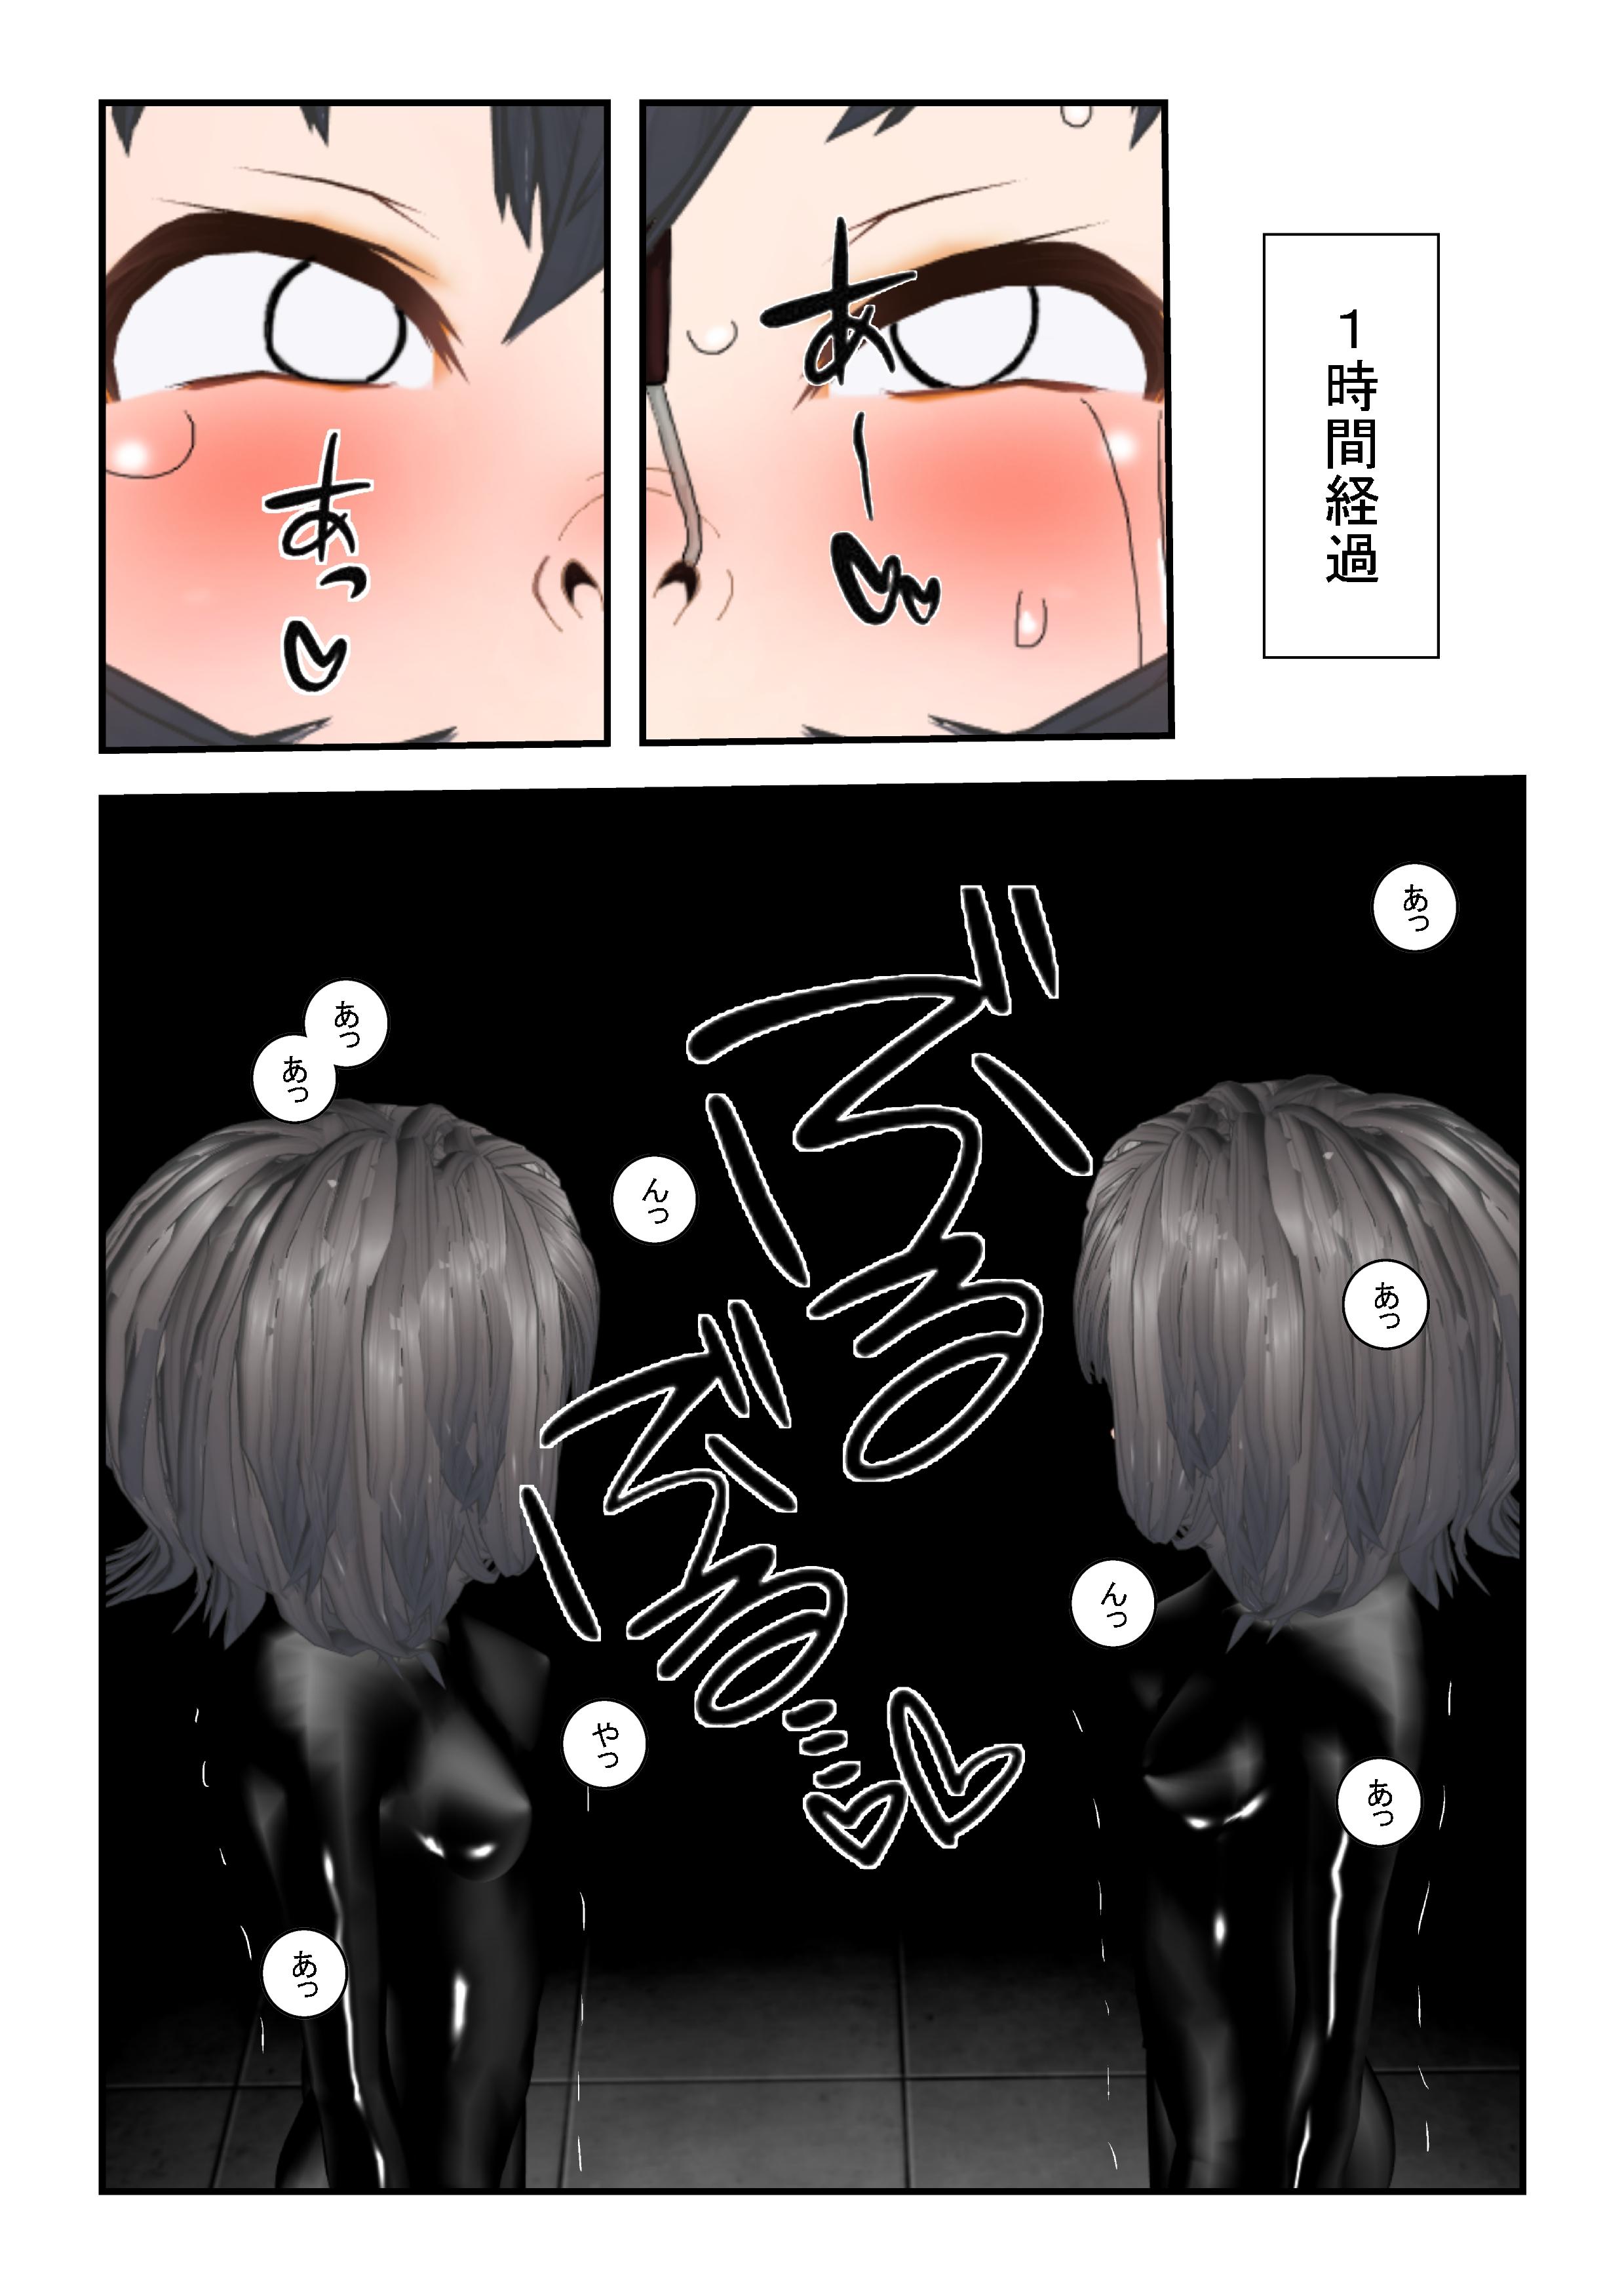 shi_0017.jpg